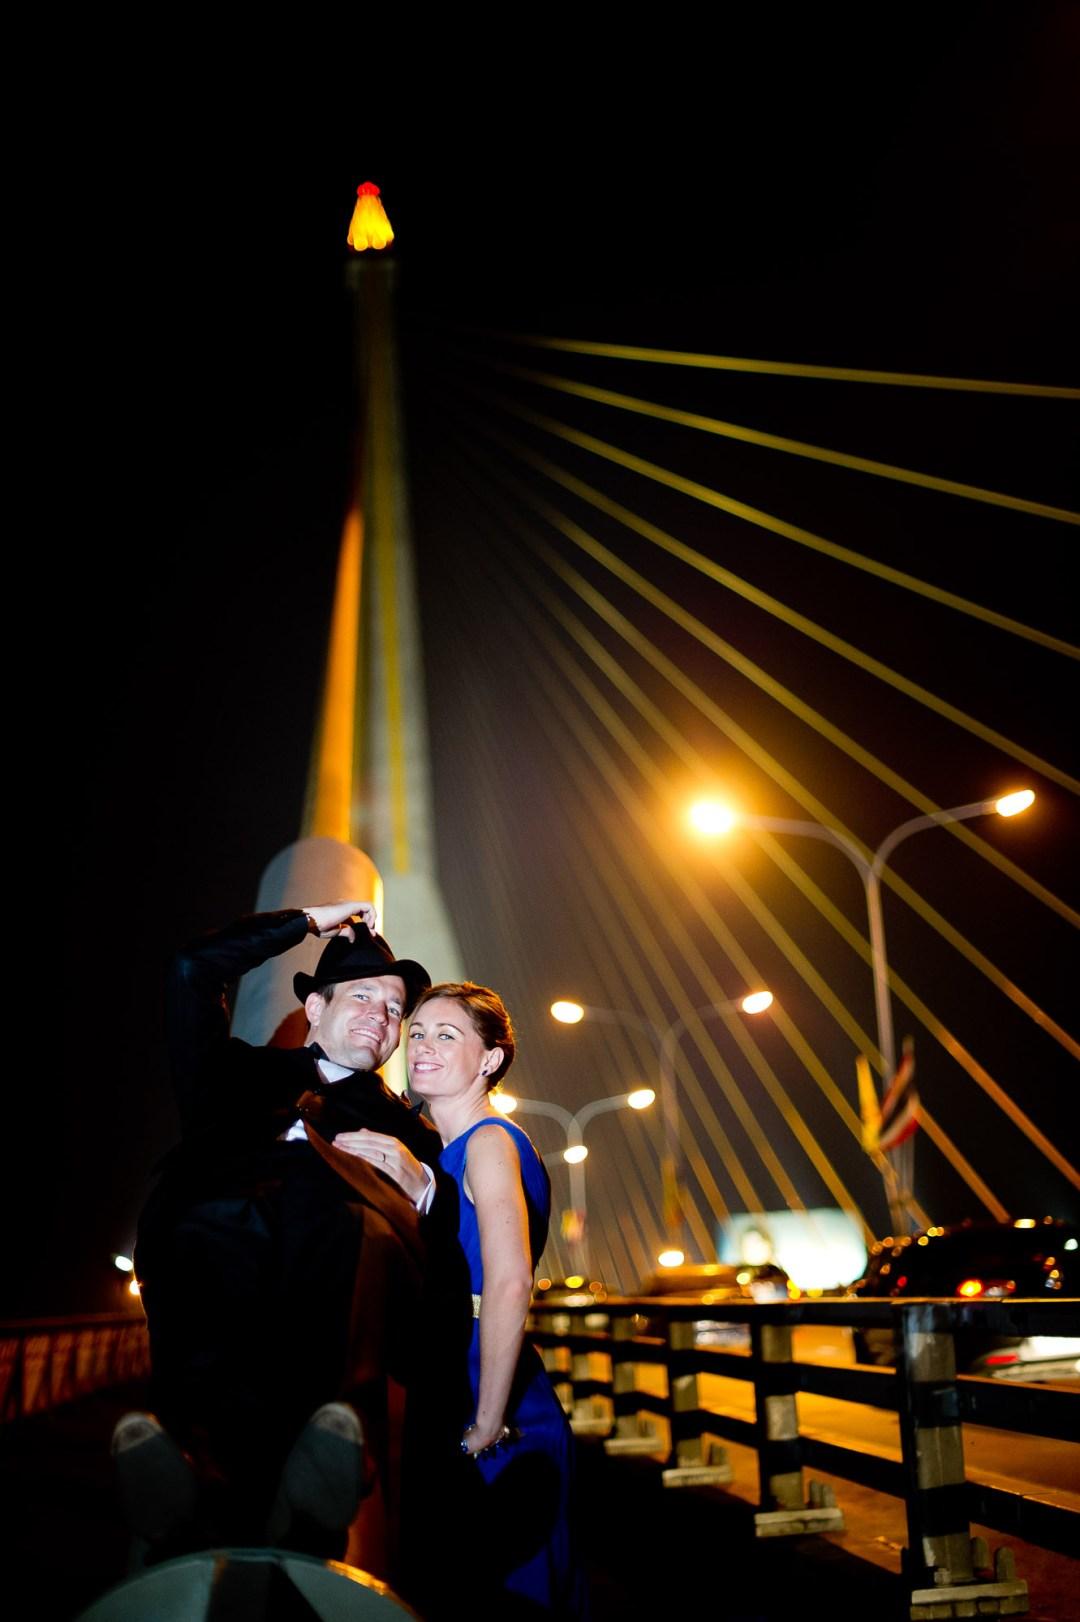 Bangkok Wedding Photography | Rama VIII Suspension Bridge Pre-Wedding Photography